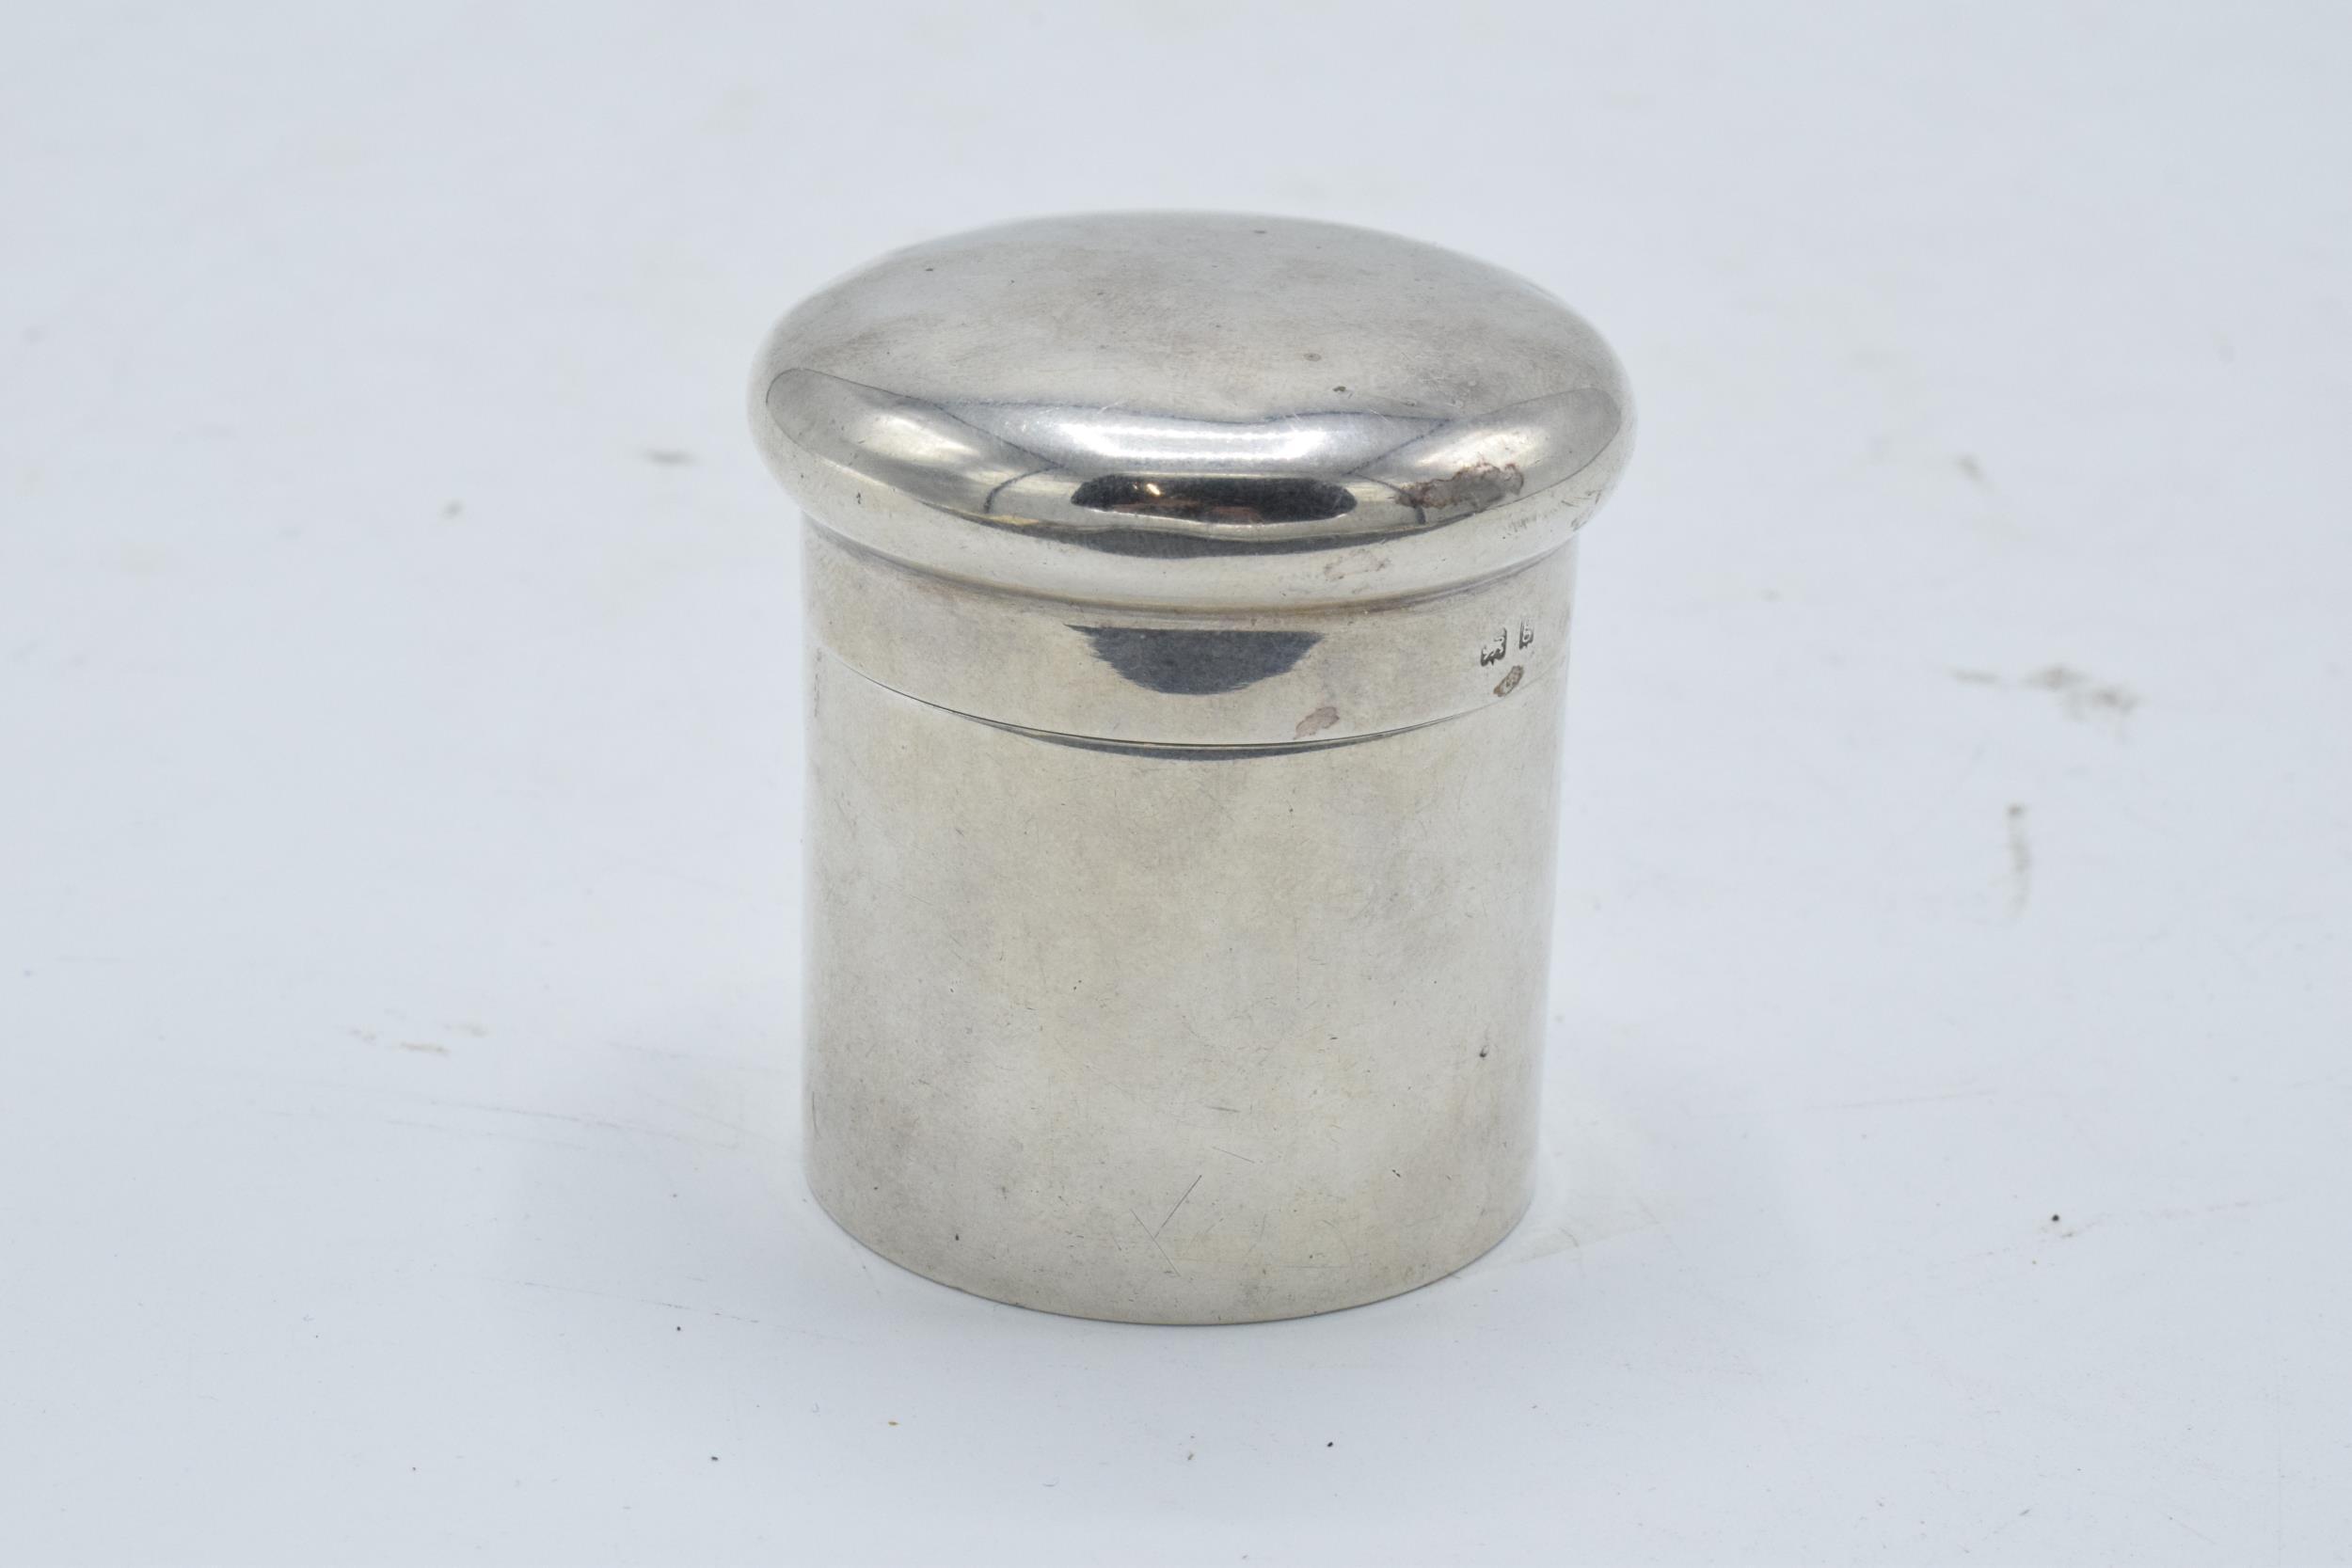 Silver cylindrical lidded pot/ box. Birmingham 1906. 45.4 grams. 5.5cm tall. - Image 2 of 4